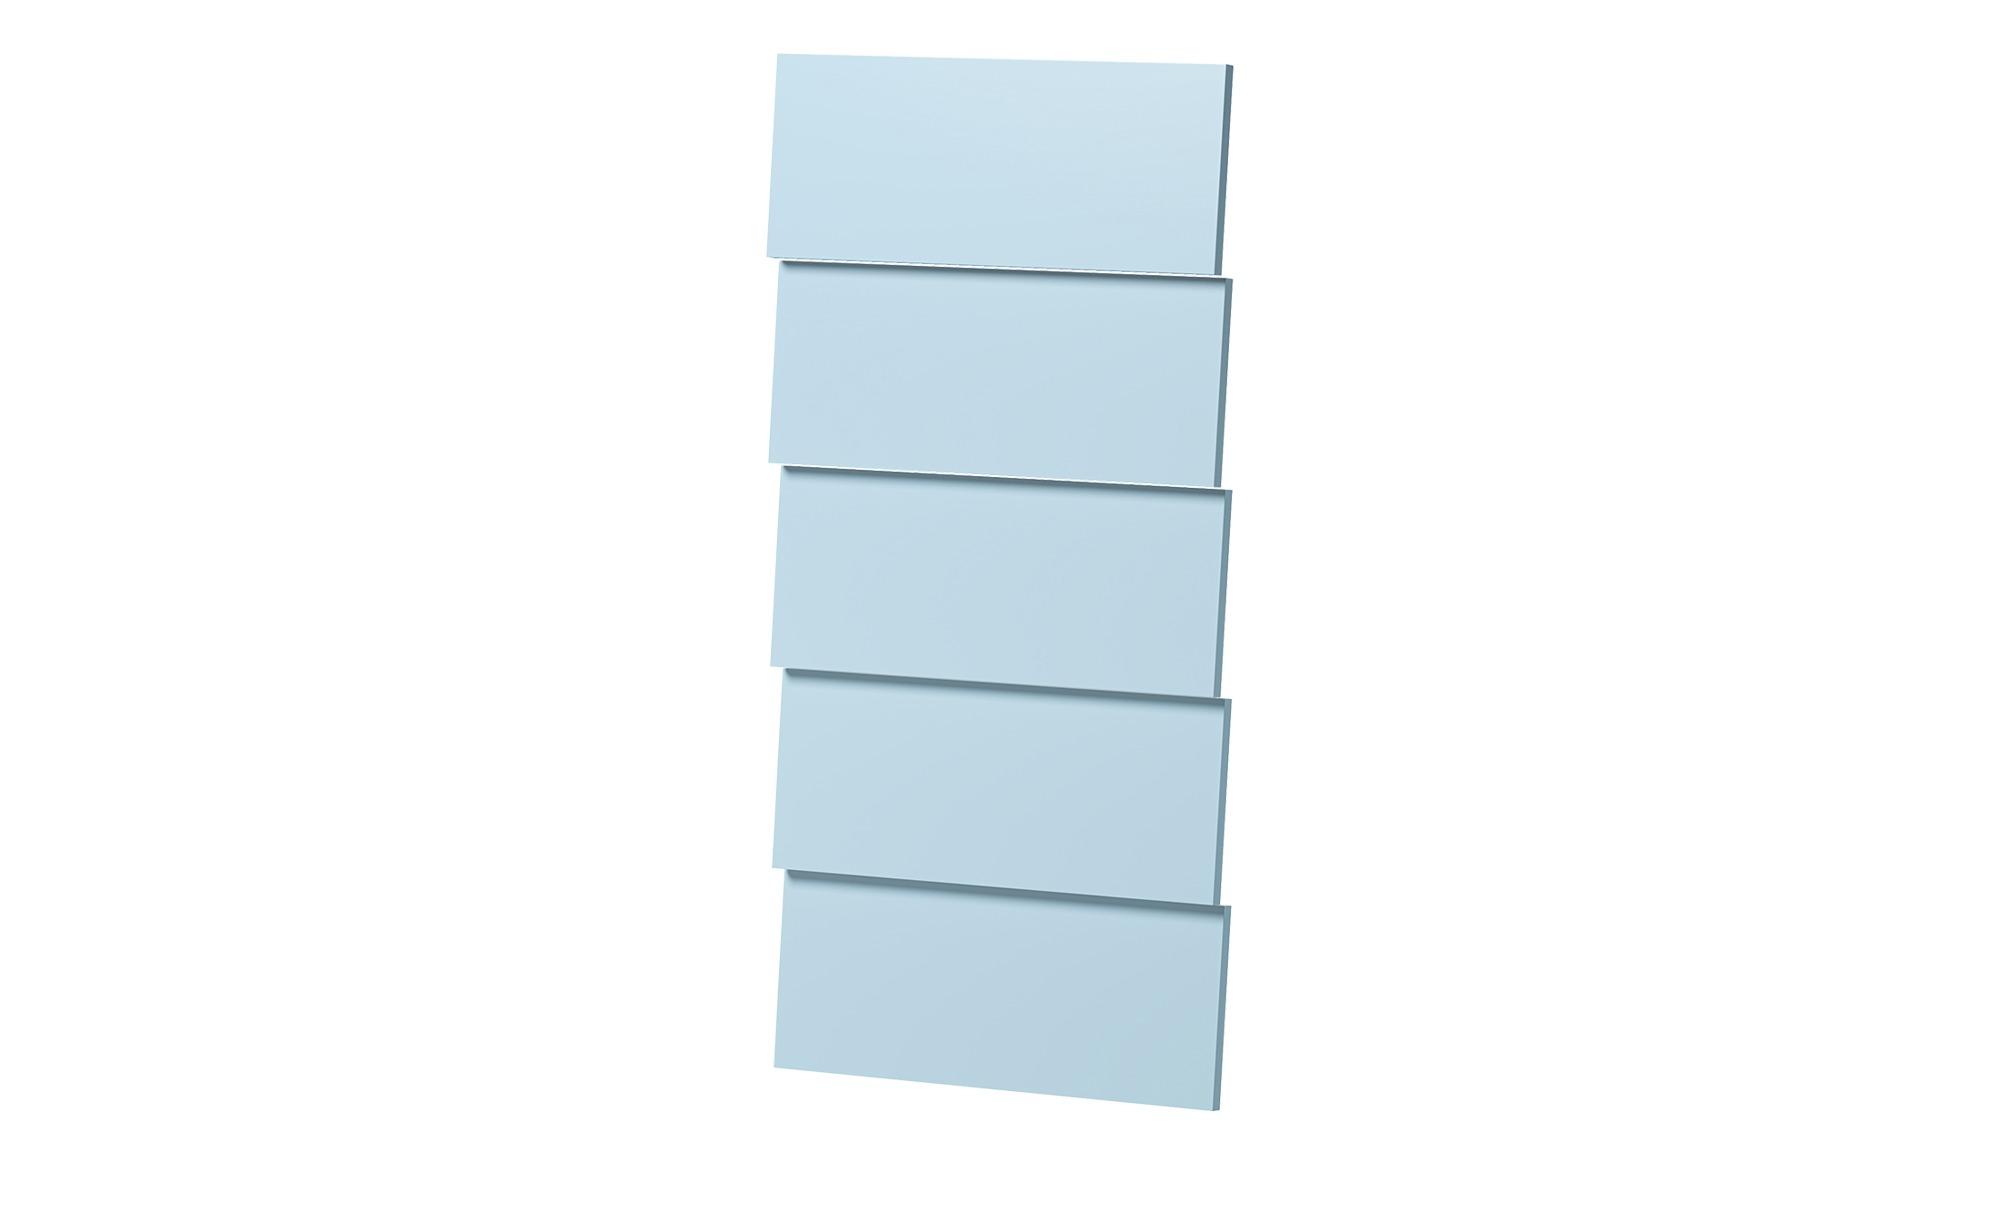 Hochkommode  Vintage Baby ¦ blau ¦ Maße (cm): B: 50,5 H: 125 T: 40,5 Kommoden & Sideboards > Kommoden - Höffner